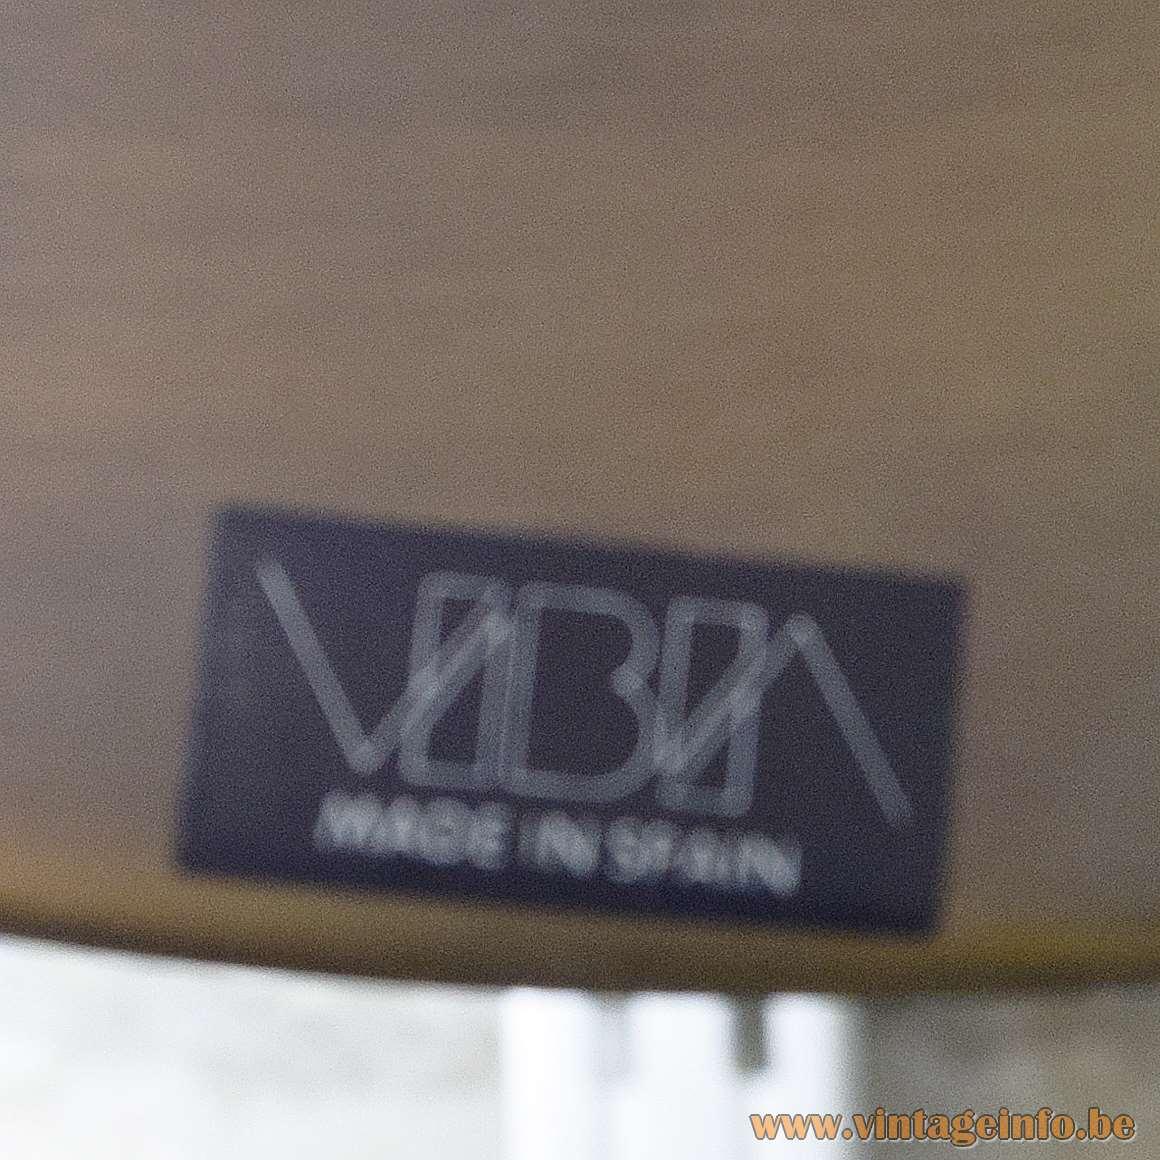 Vibia Boston pendant lamp 1989 design: Vidal Pedrals black rectangular label & logo 1980s 1990s Spain